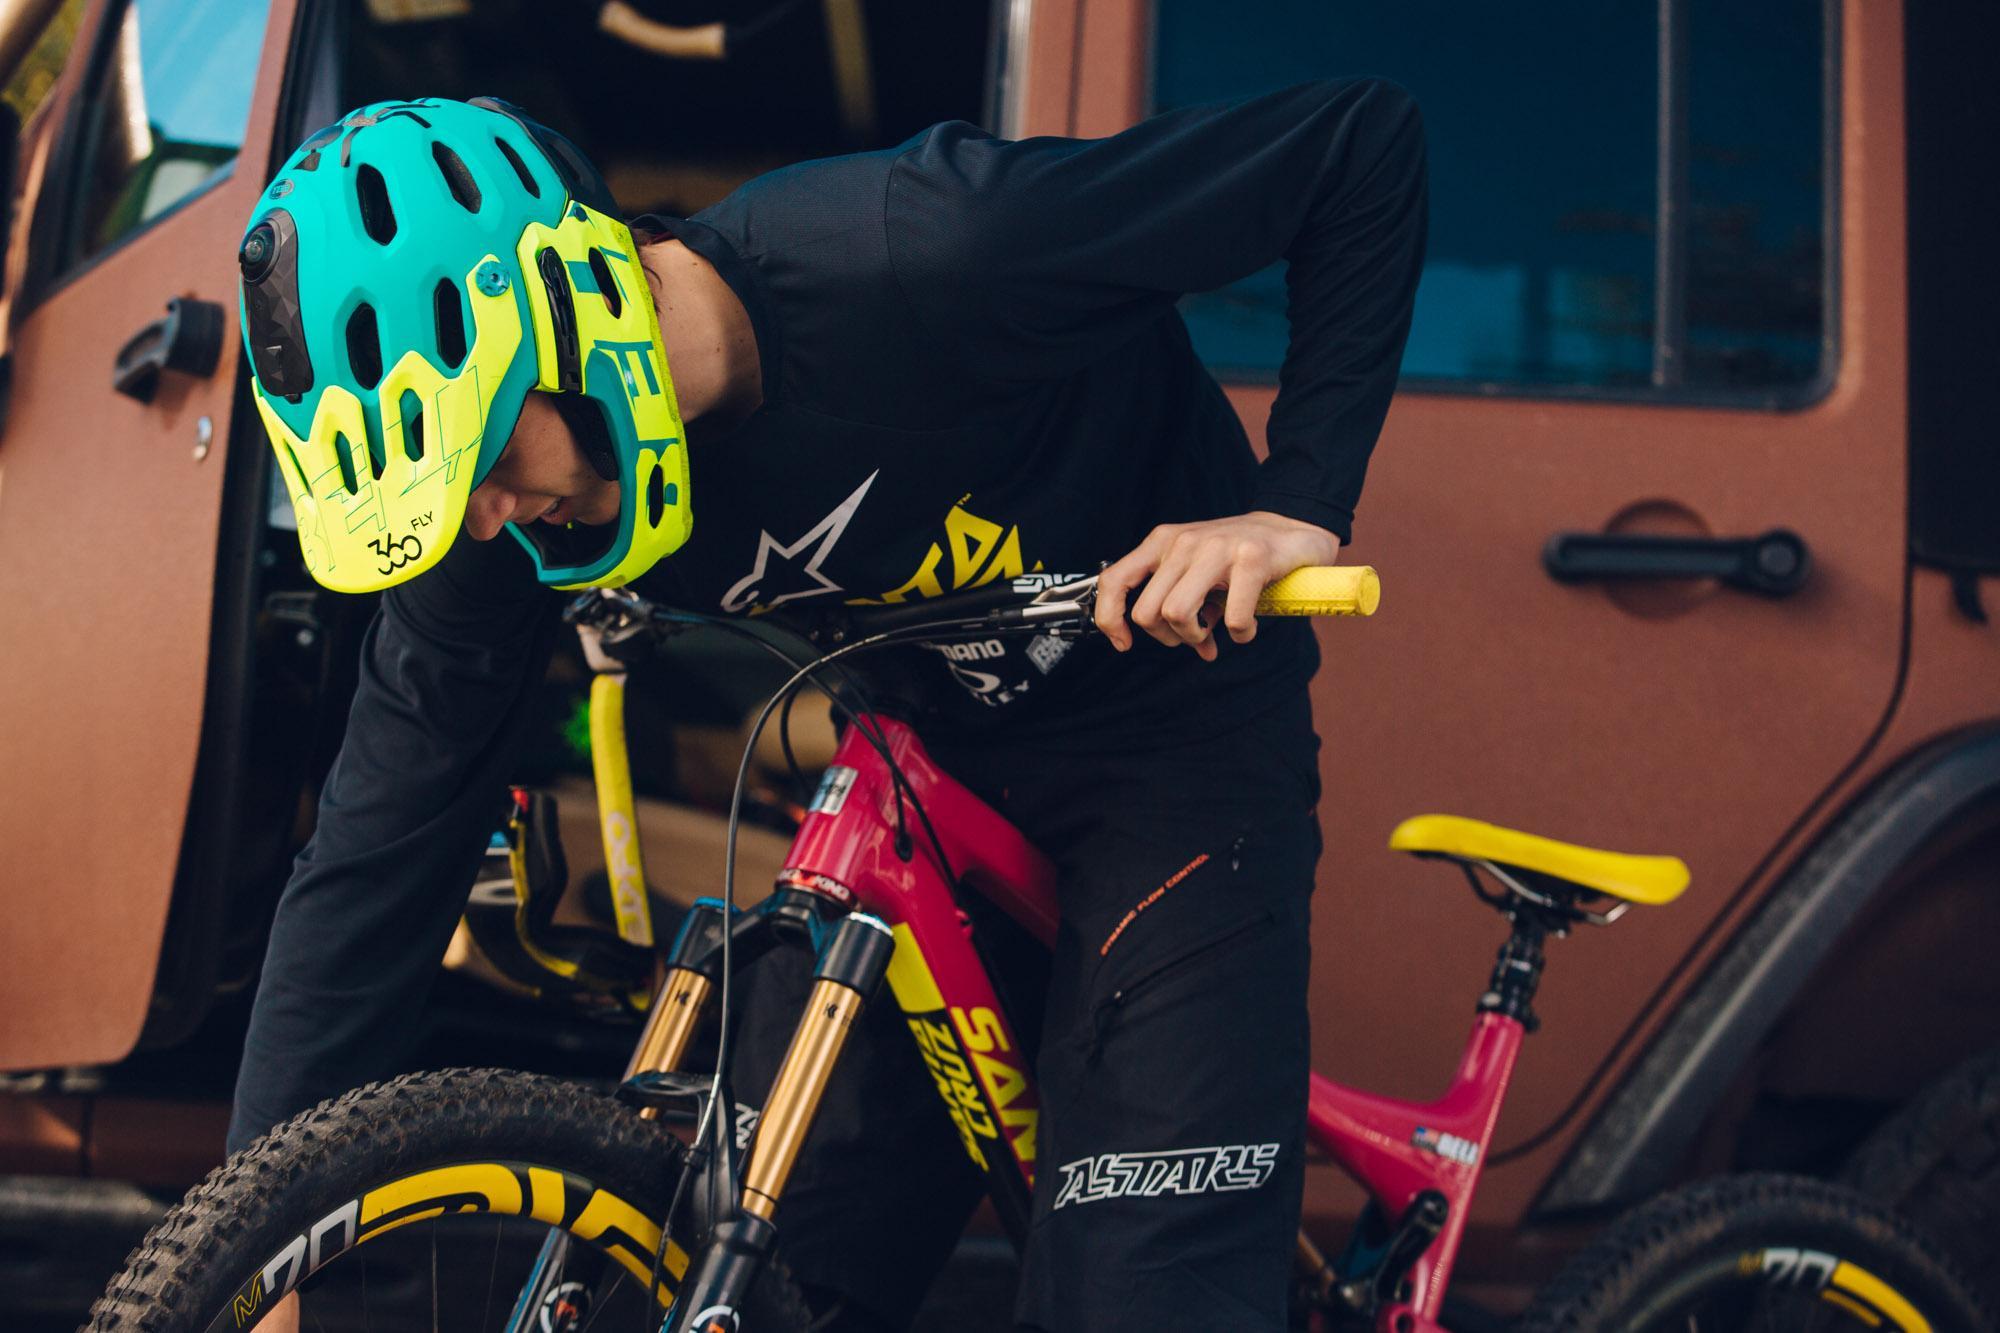 360fly_BRG Mt Bike Helmet_Bike